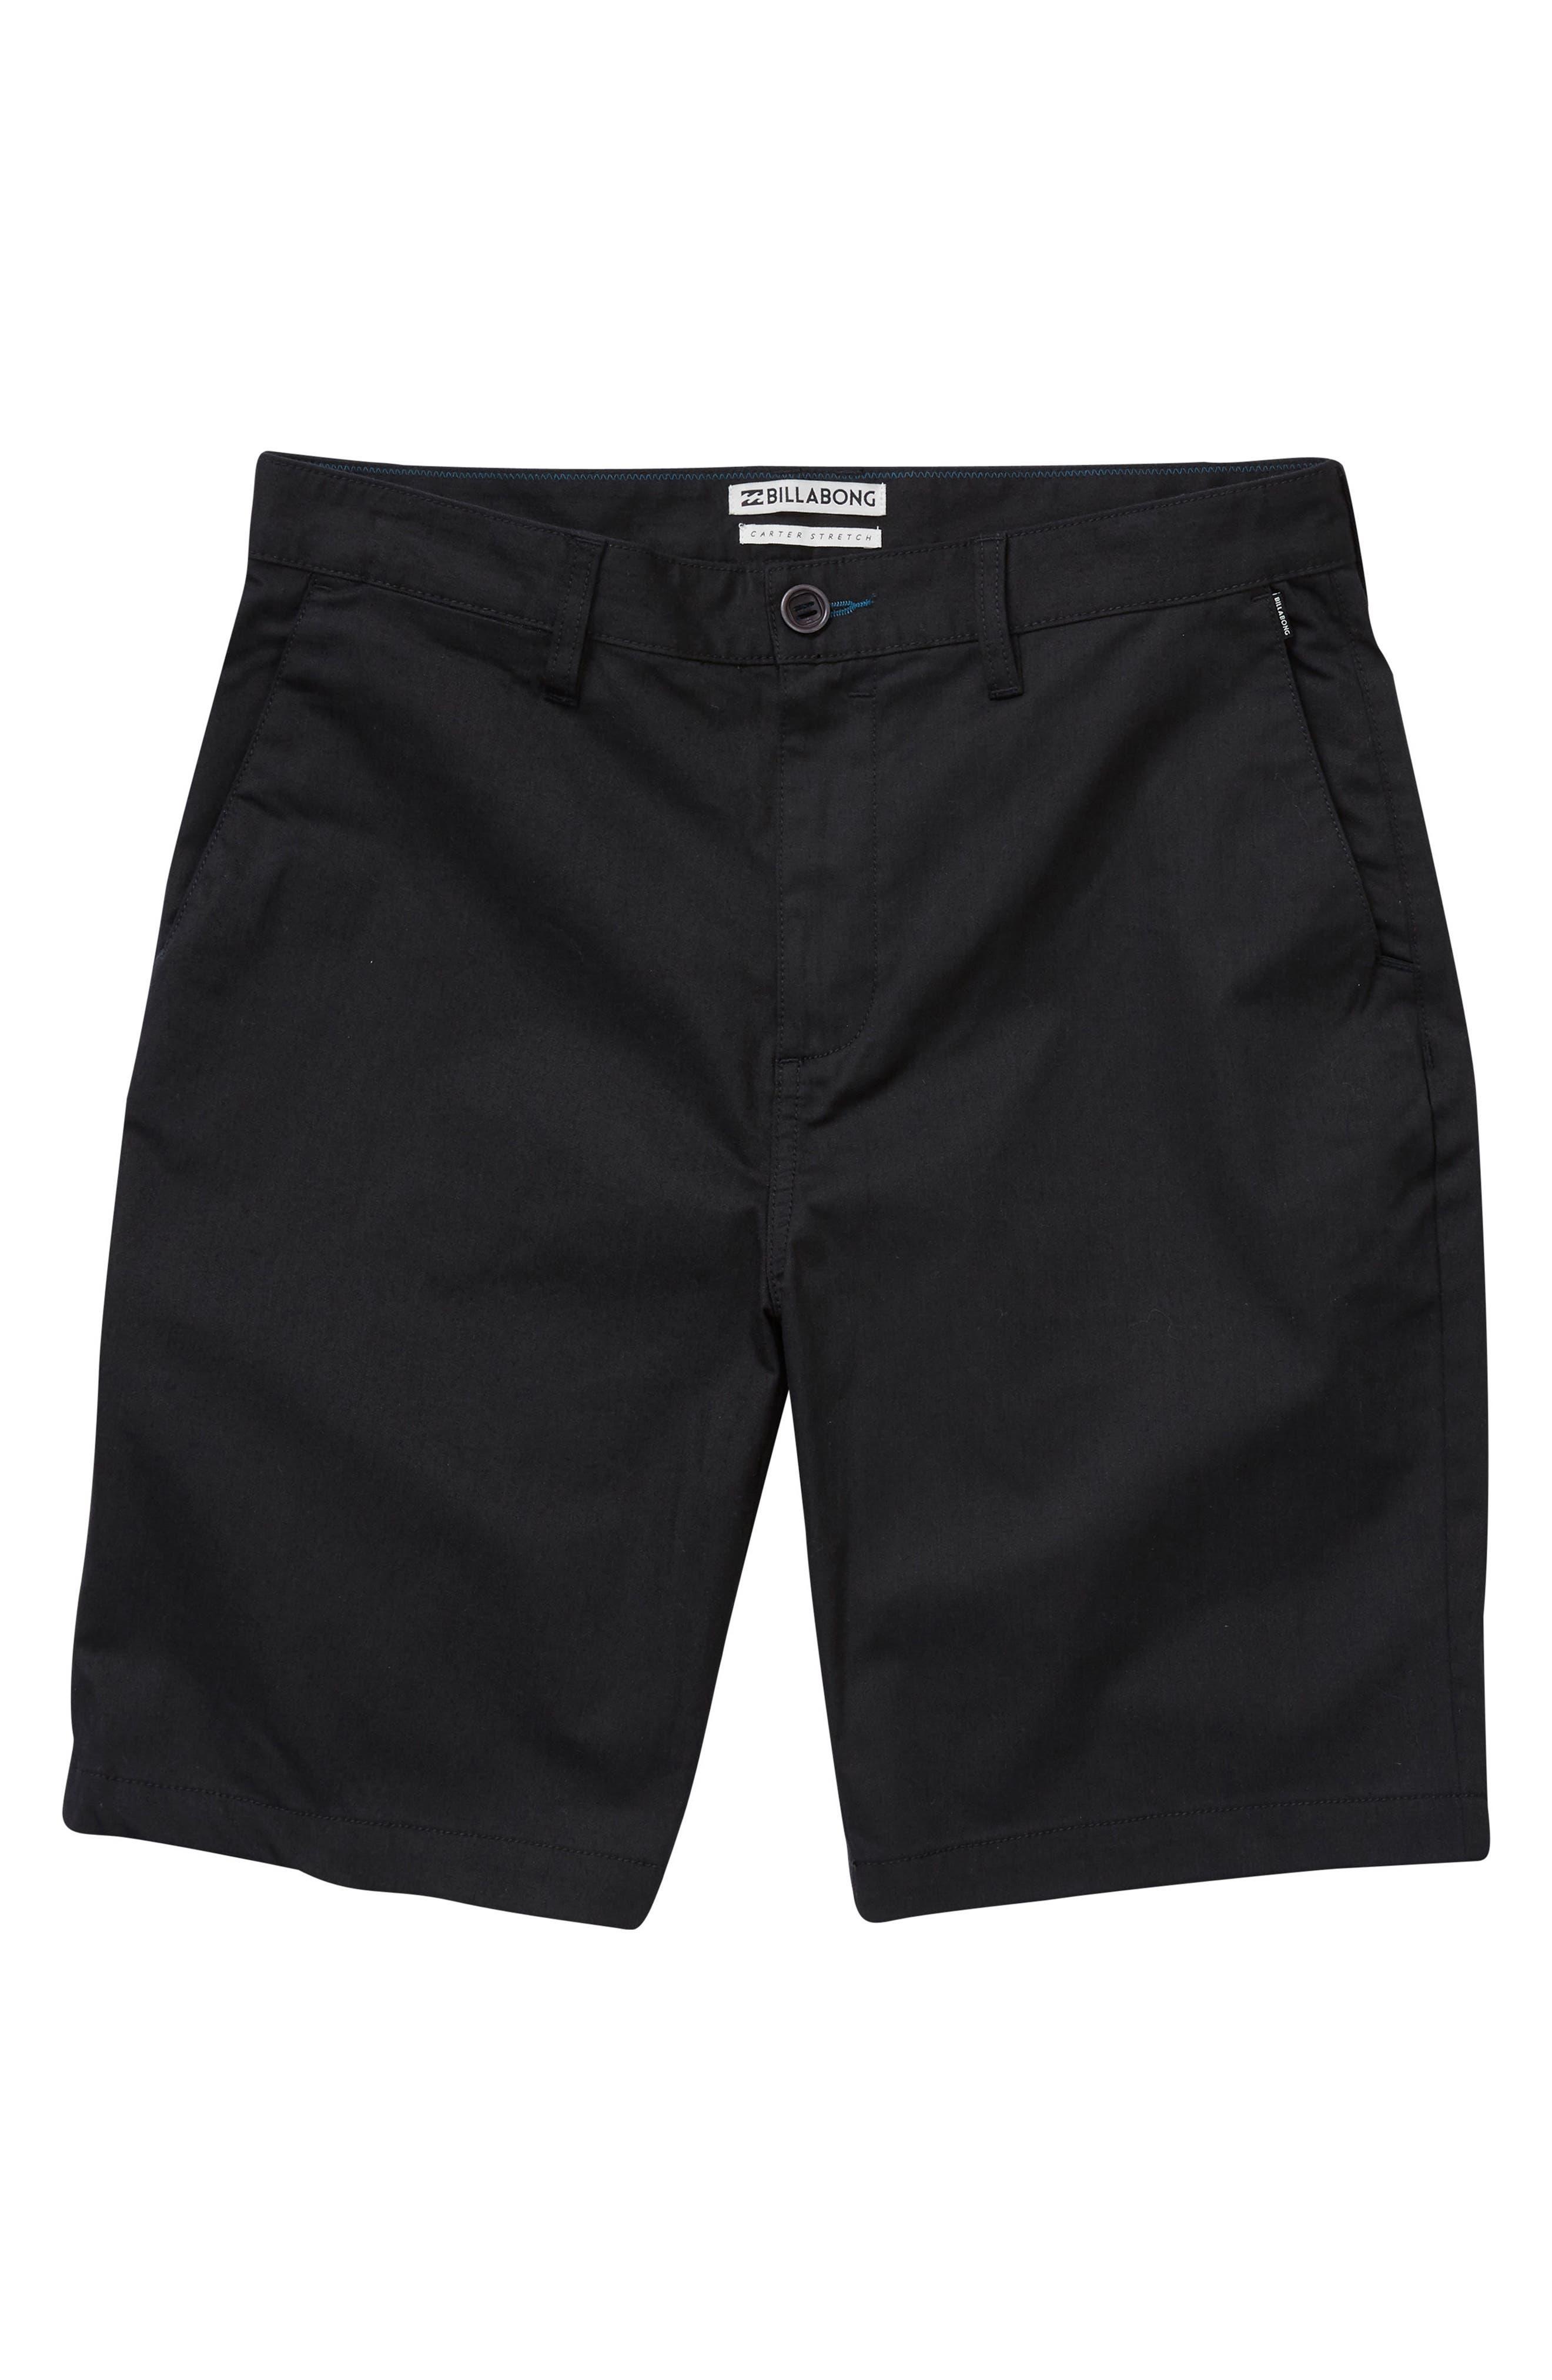 Alternate Image 1 Selected - Billabong Carter Stretch Twill Shorts (Big Boys)